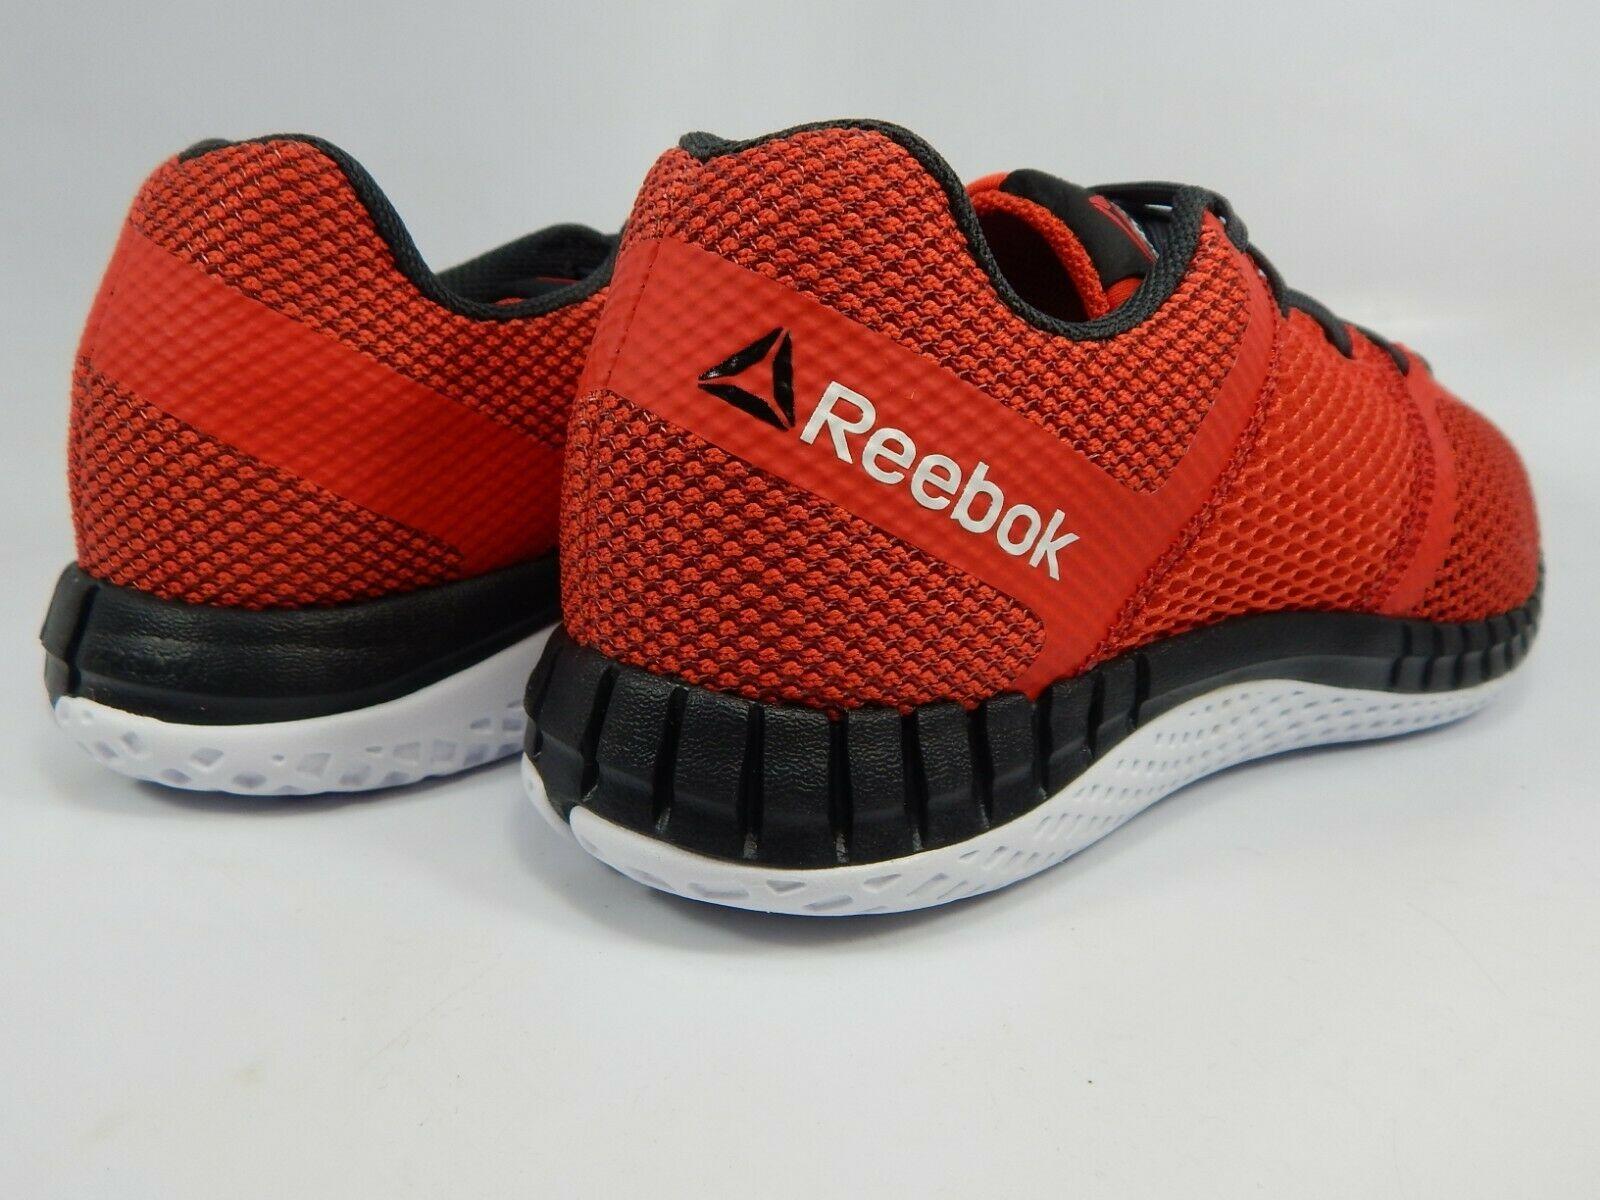 Reebok Zsprint Size 5 Y EU 36.5 Boy's / Girl's Running Athletic Shoes Red Q23501